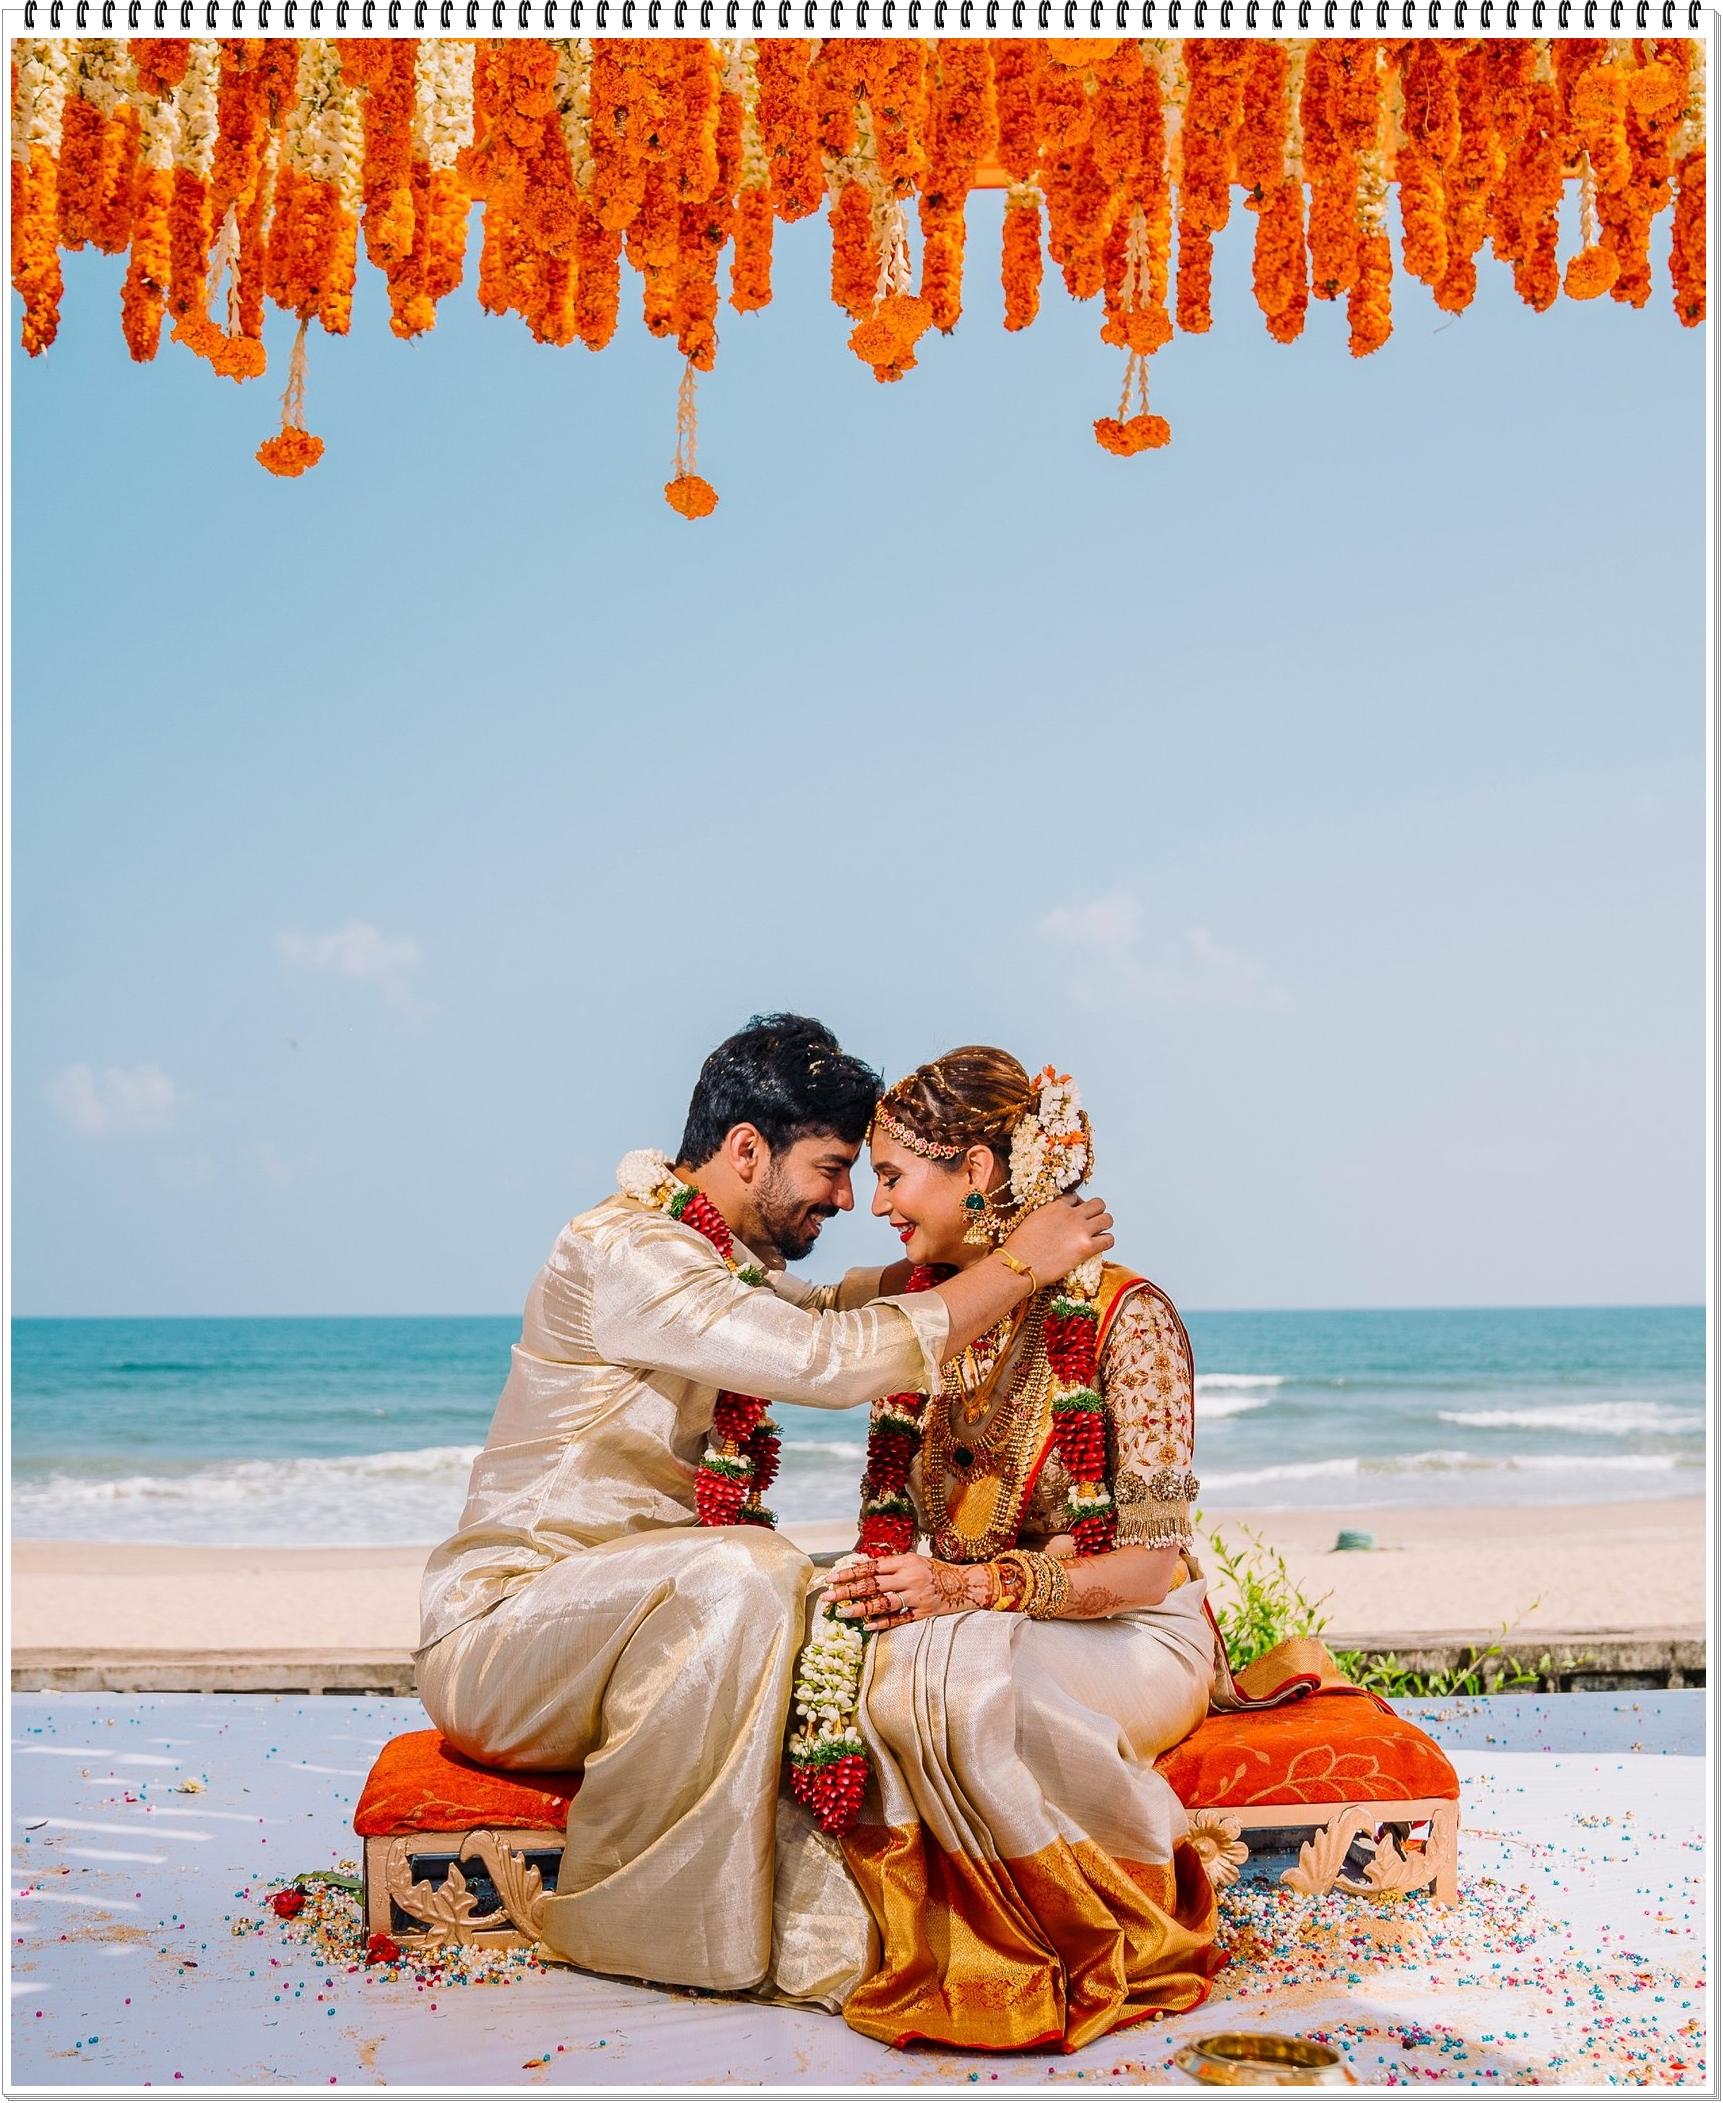 mahat-raghavendra-prachi-mishra-marriage-3